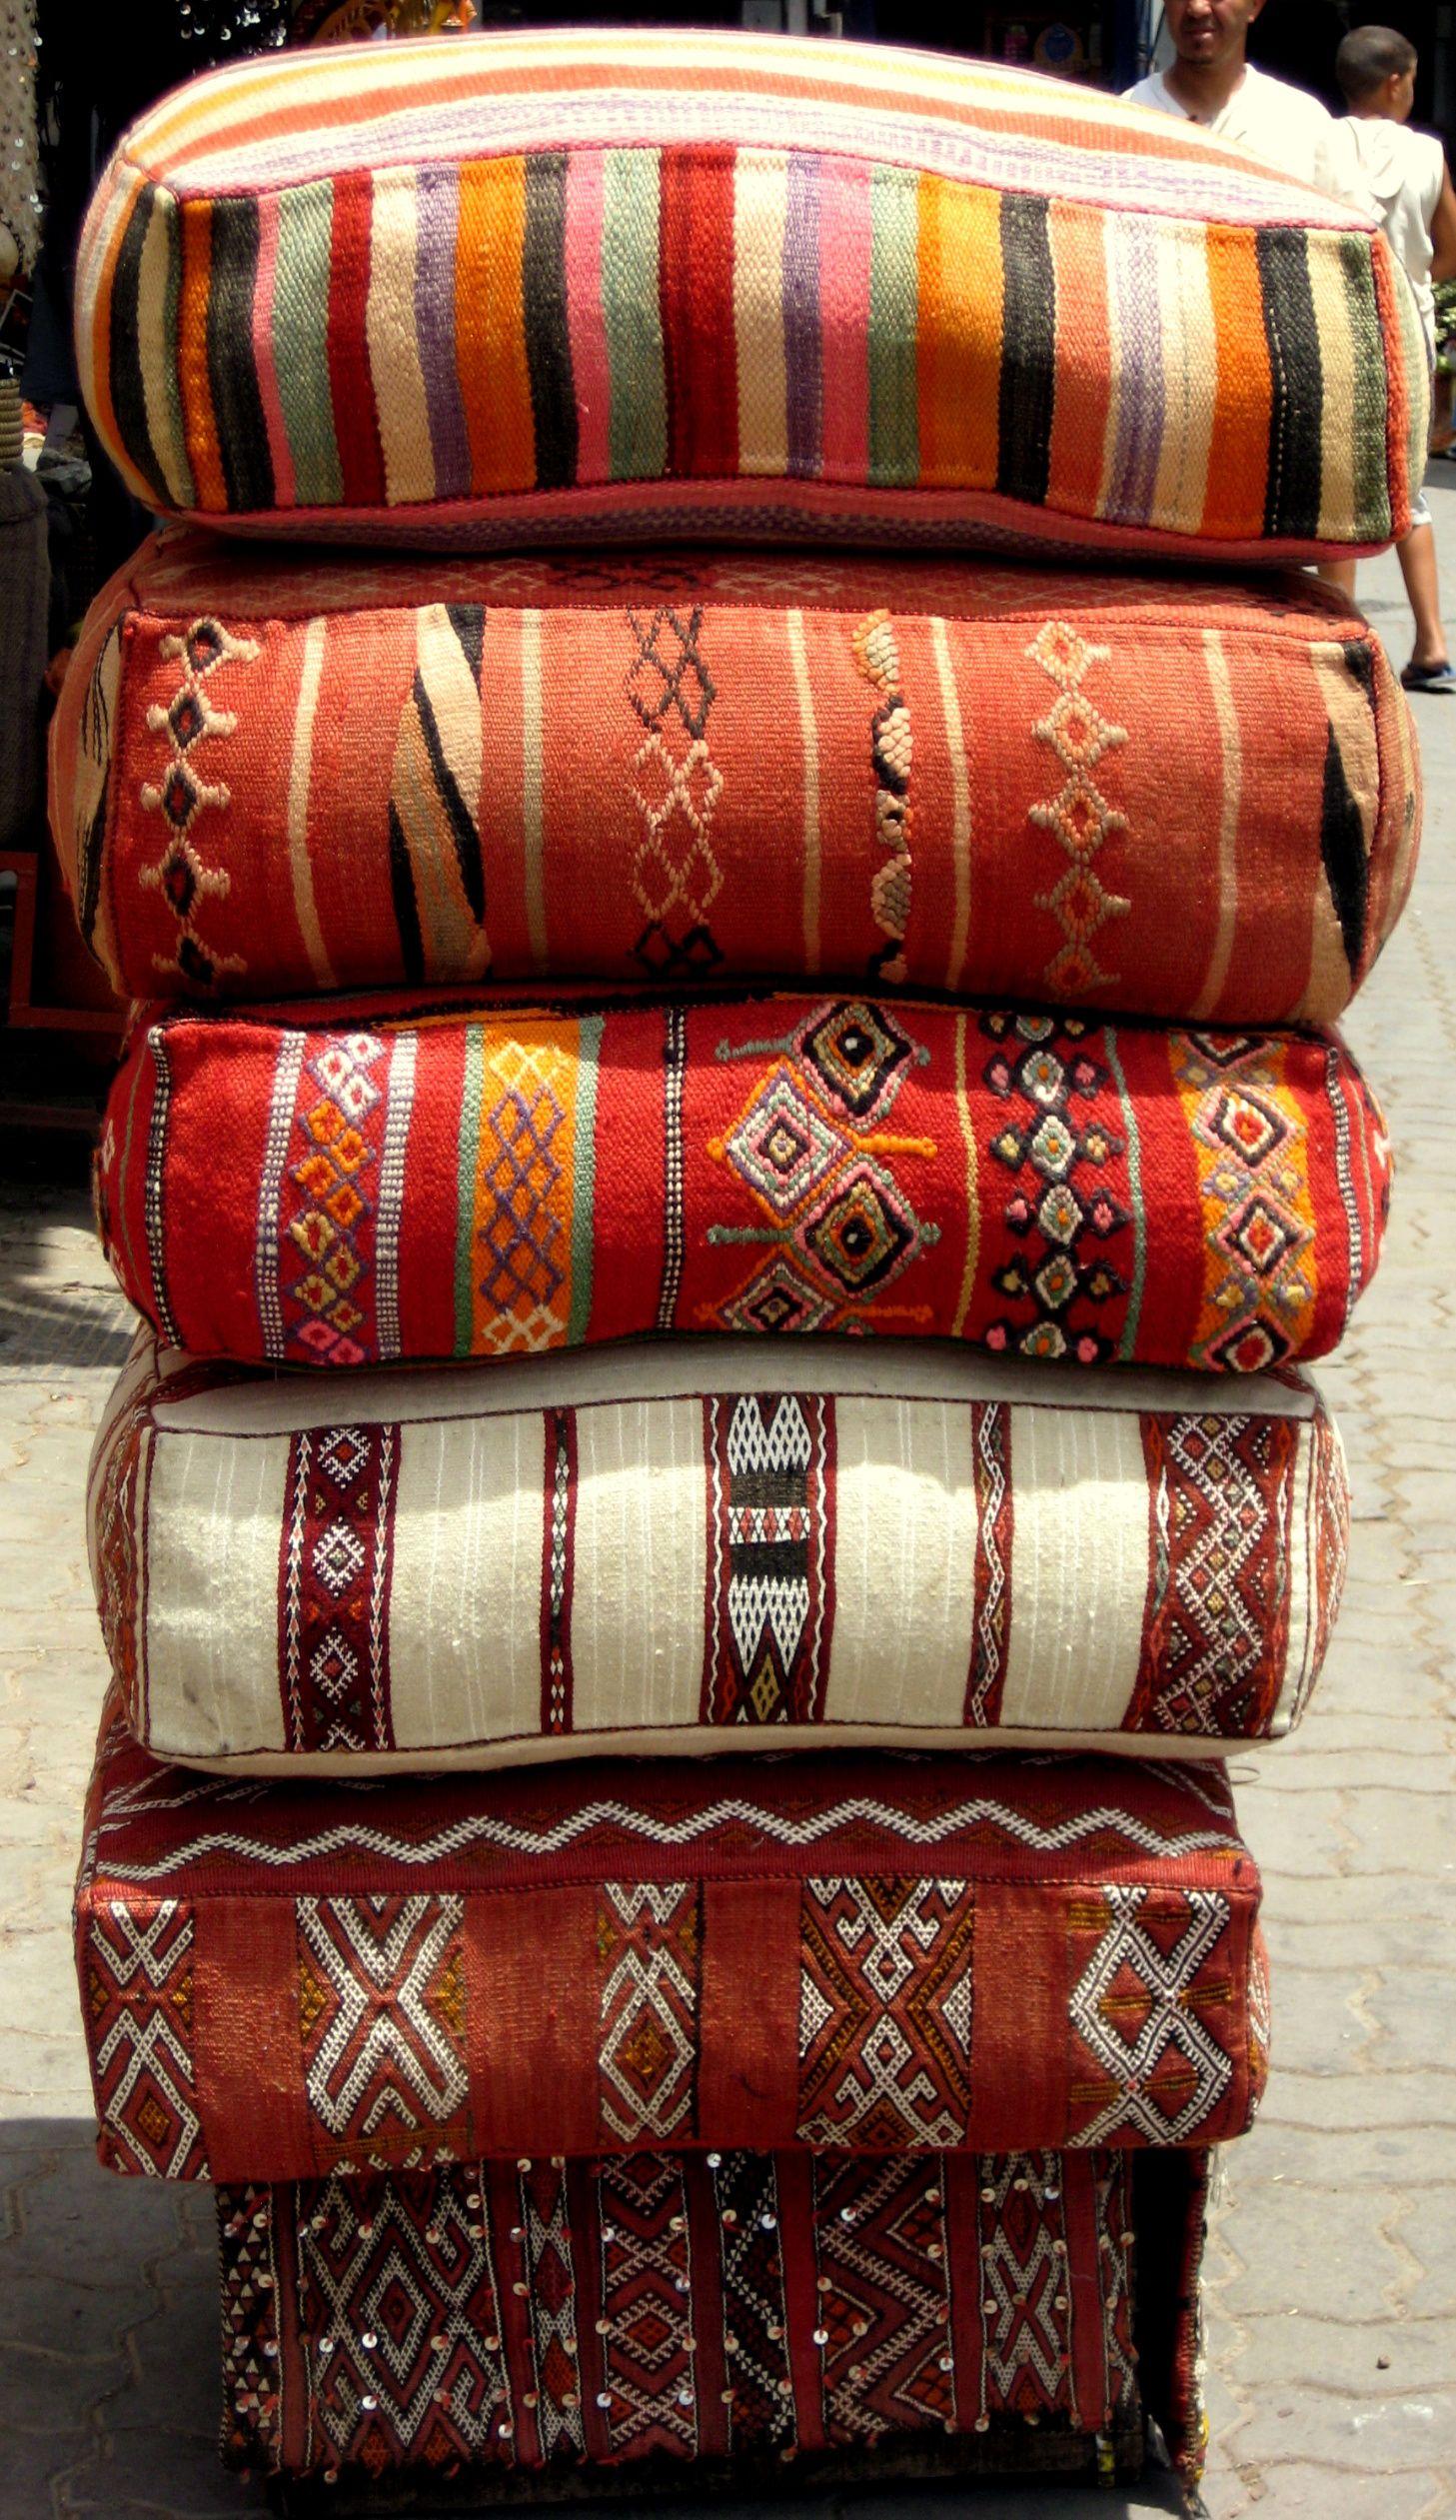 maisonandmaison enlarge cushion online floor pillows to r homewares pillow click moroccan details e